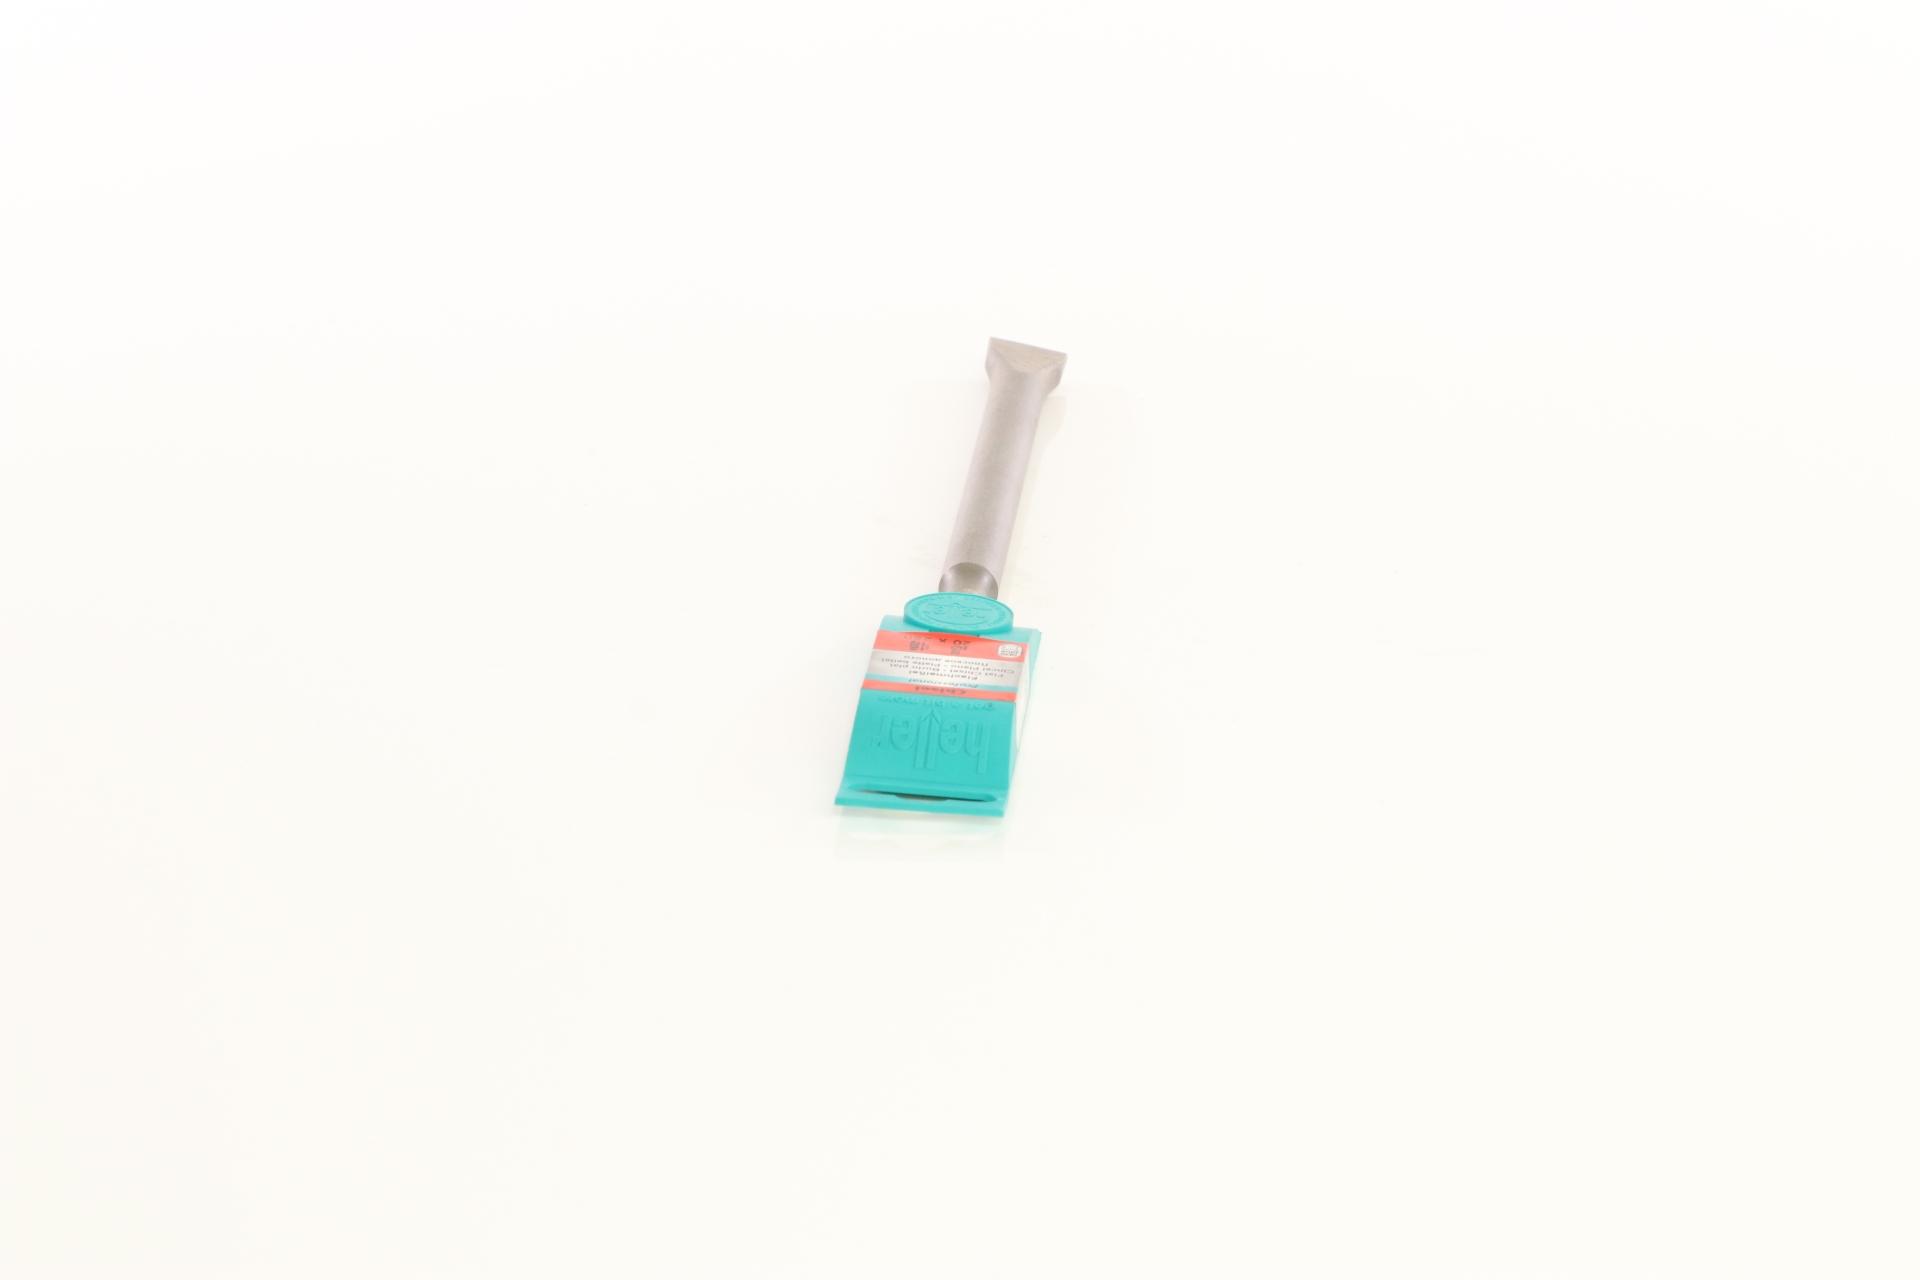 heller EnDuro SDS-plus Flachmeißel, B/G: 20/250 mm